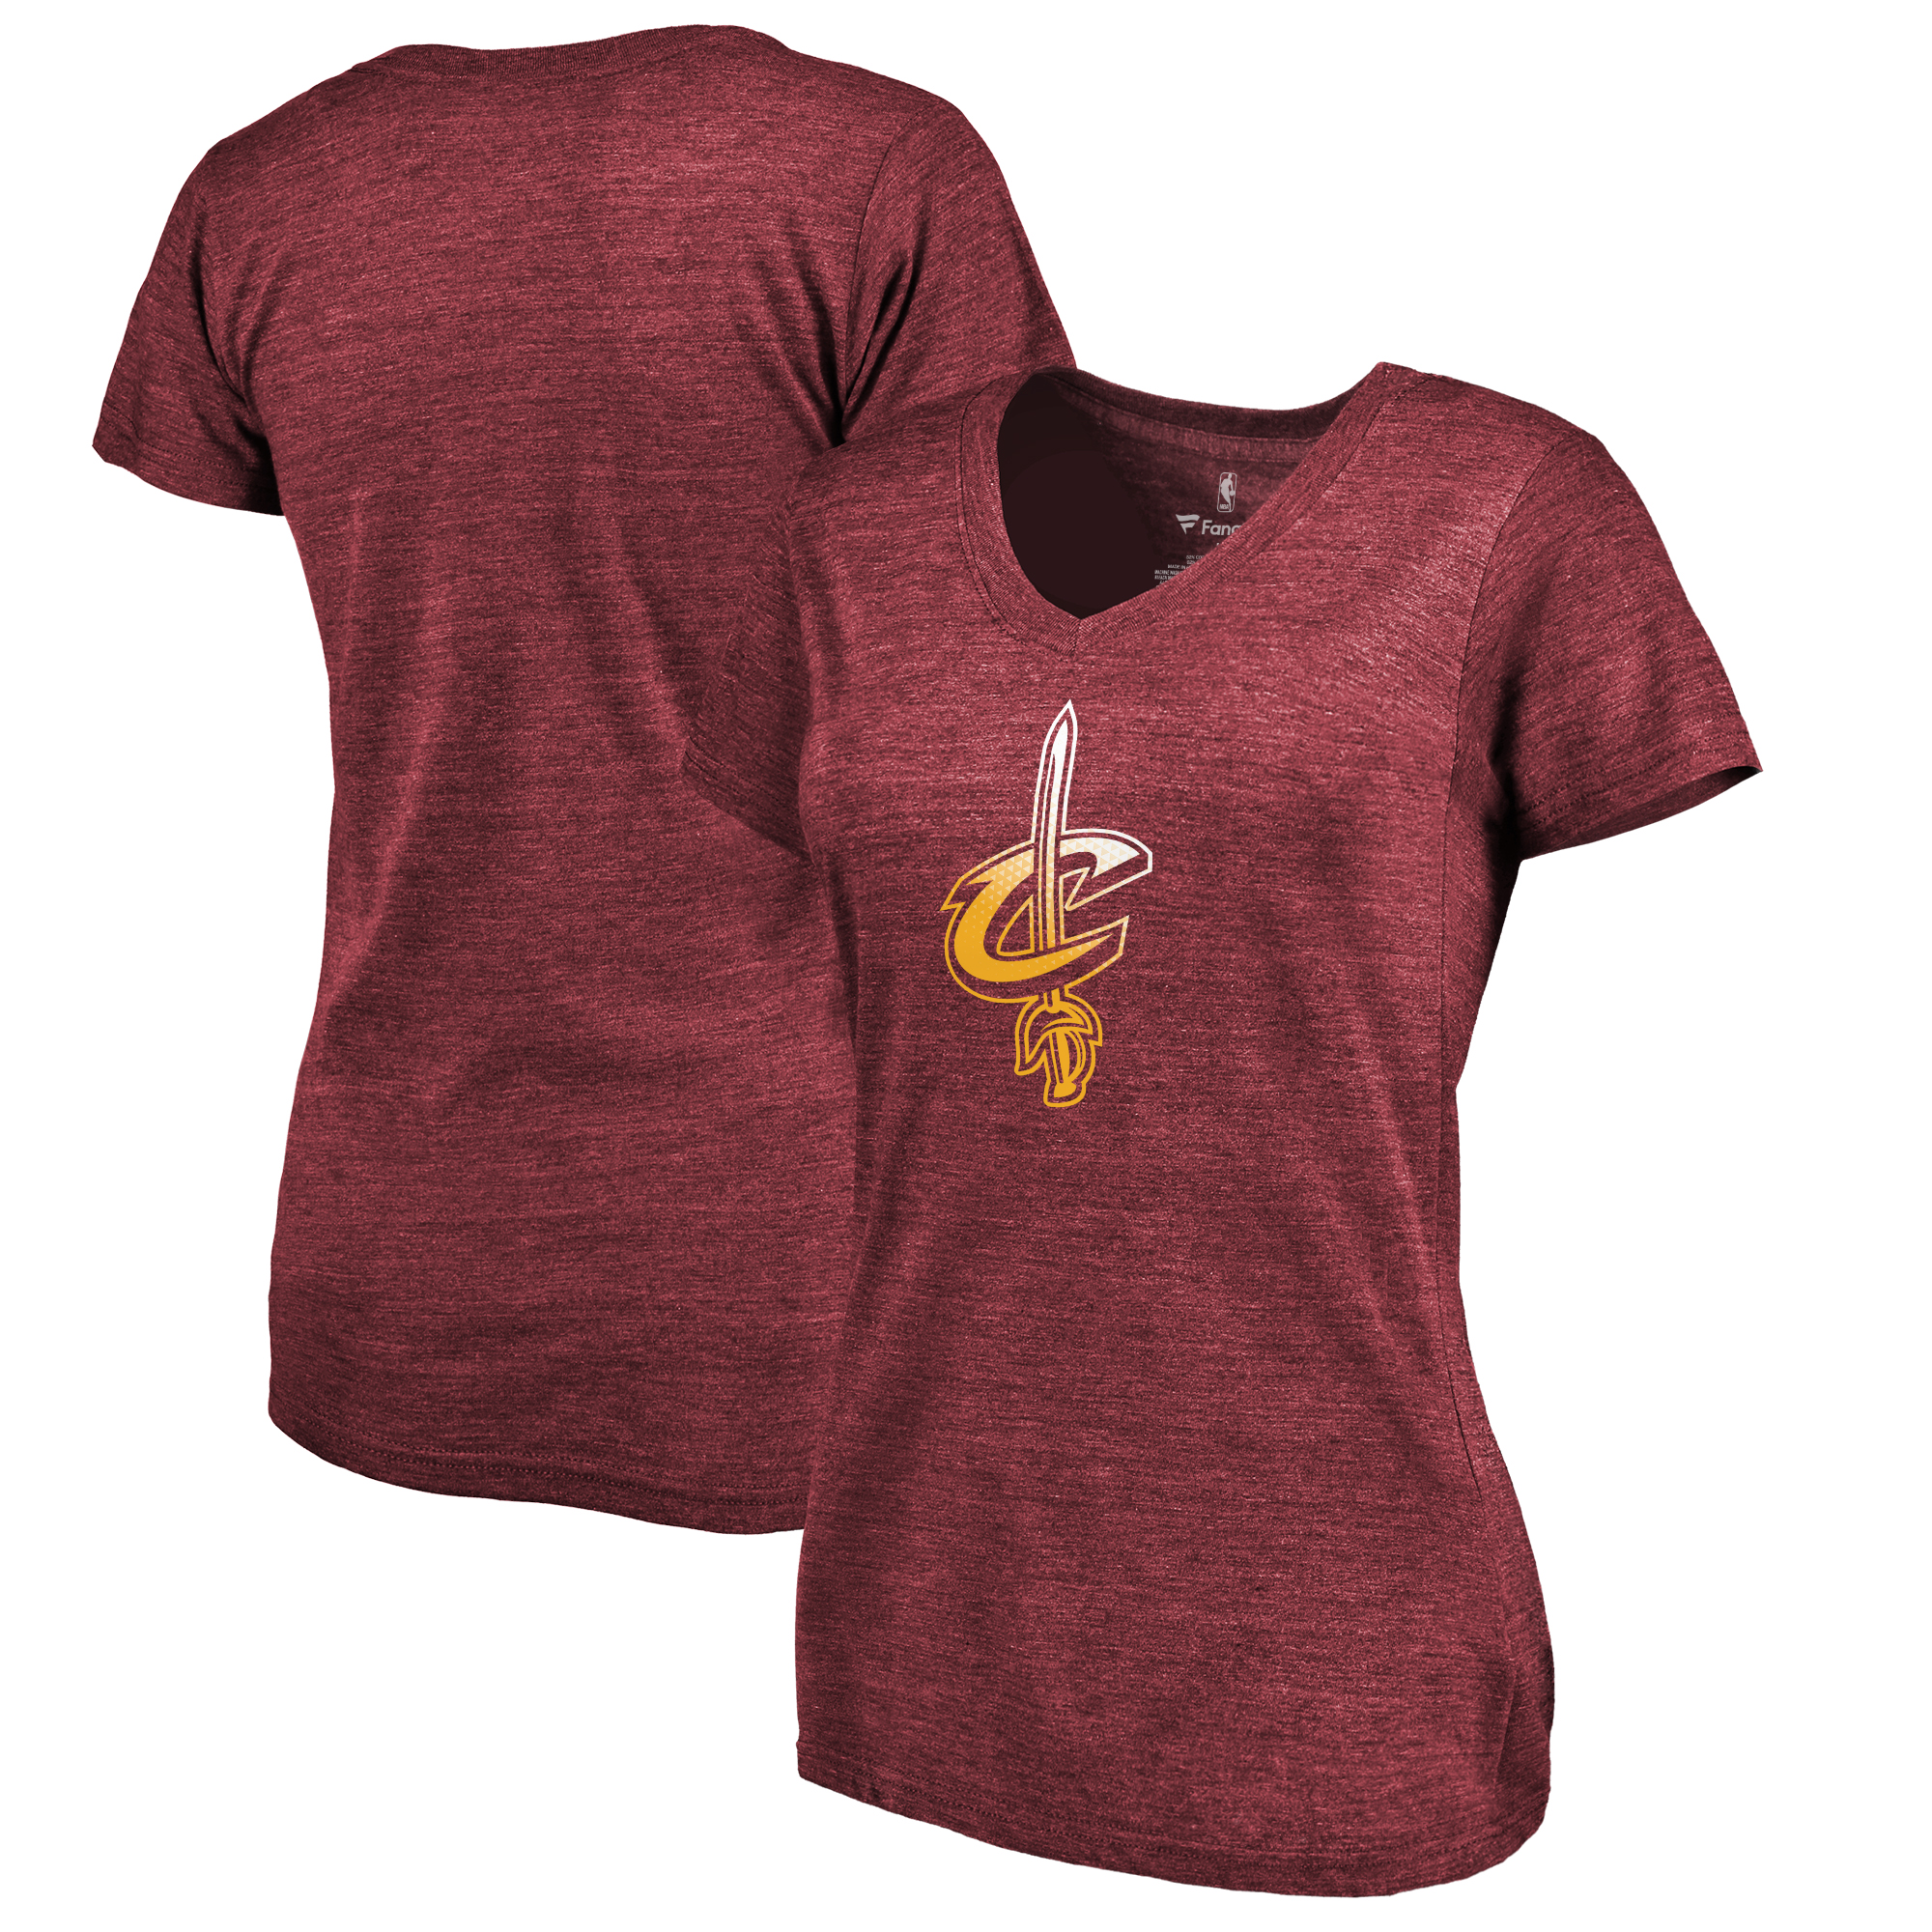 Cleveland Cavaliers Fanatics Branded Women's Gradient Logo Tri-Blend T-Shirt - Maroon